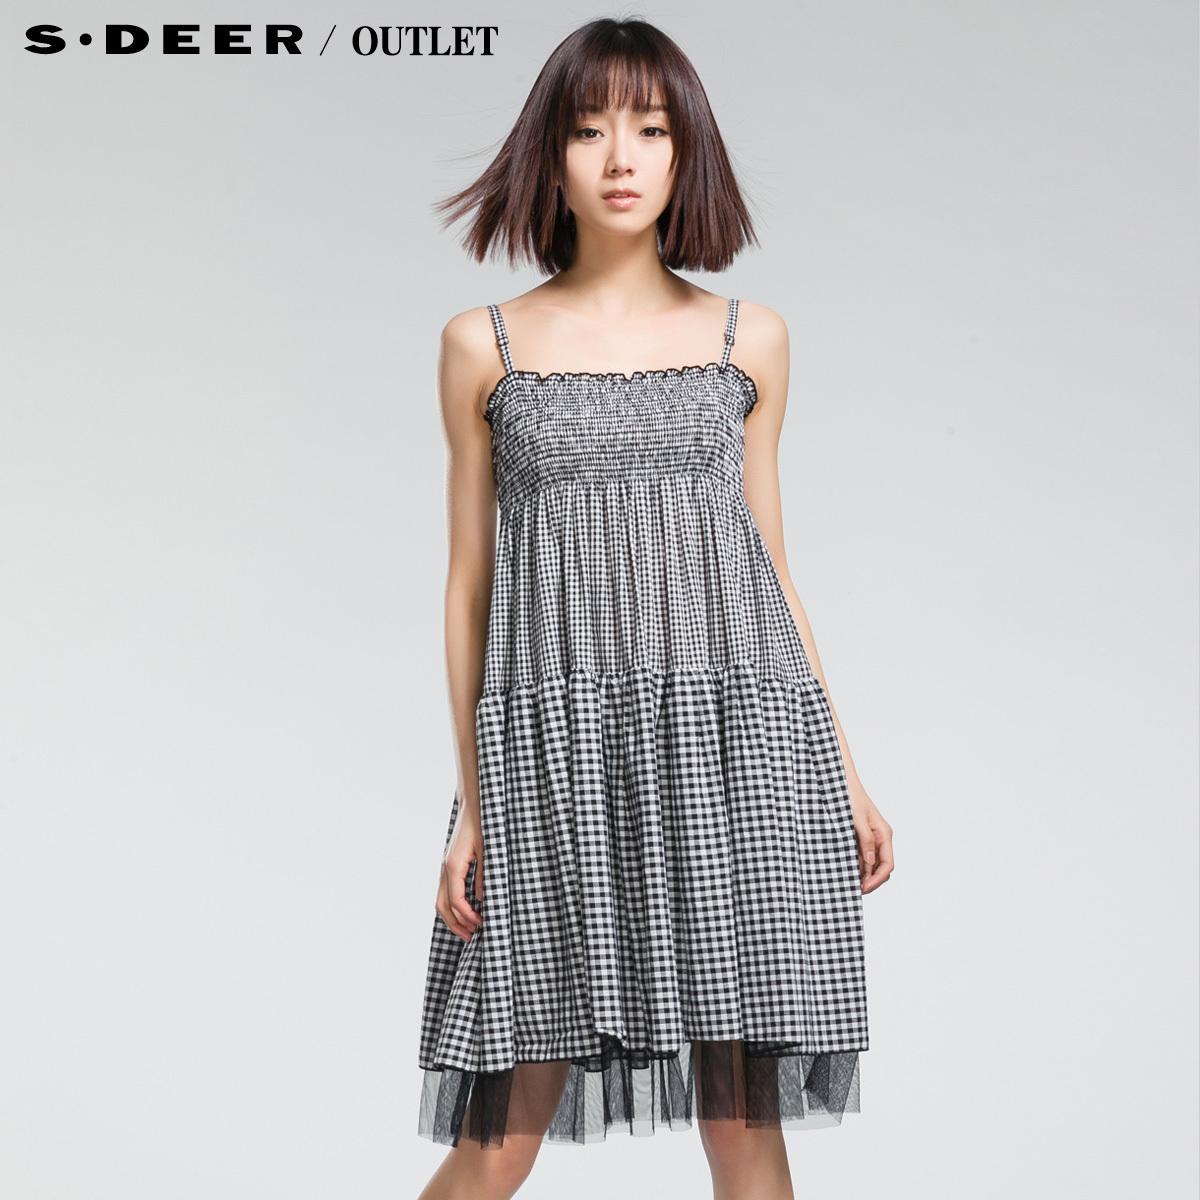 Женское платье S.deer 1281215 Sdeer